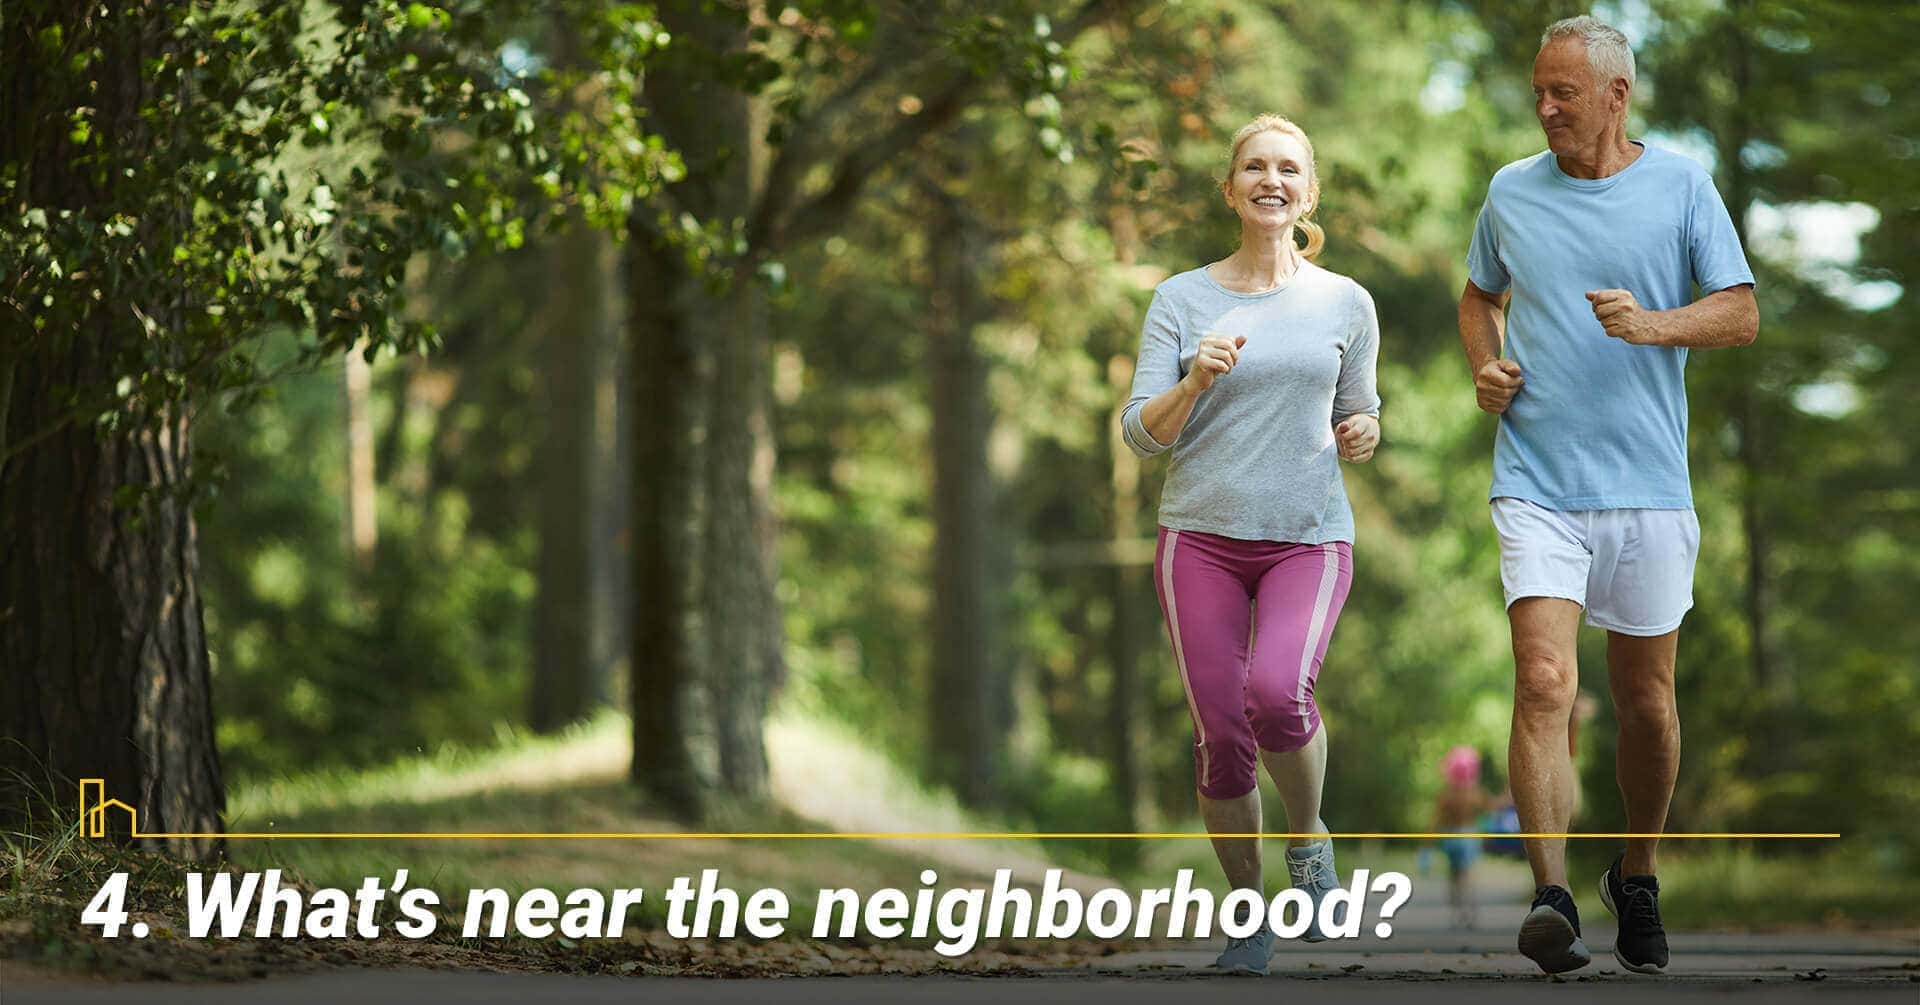 What's near the neighborhood?